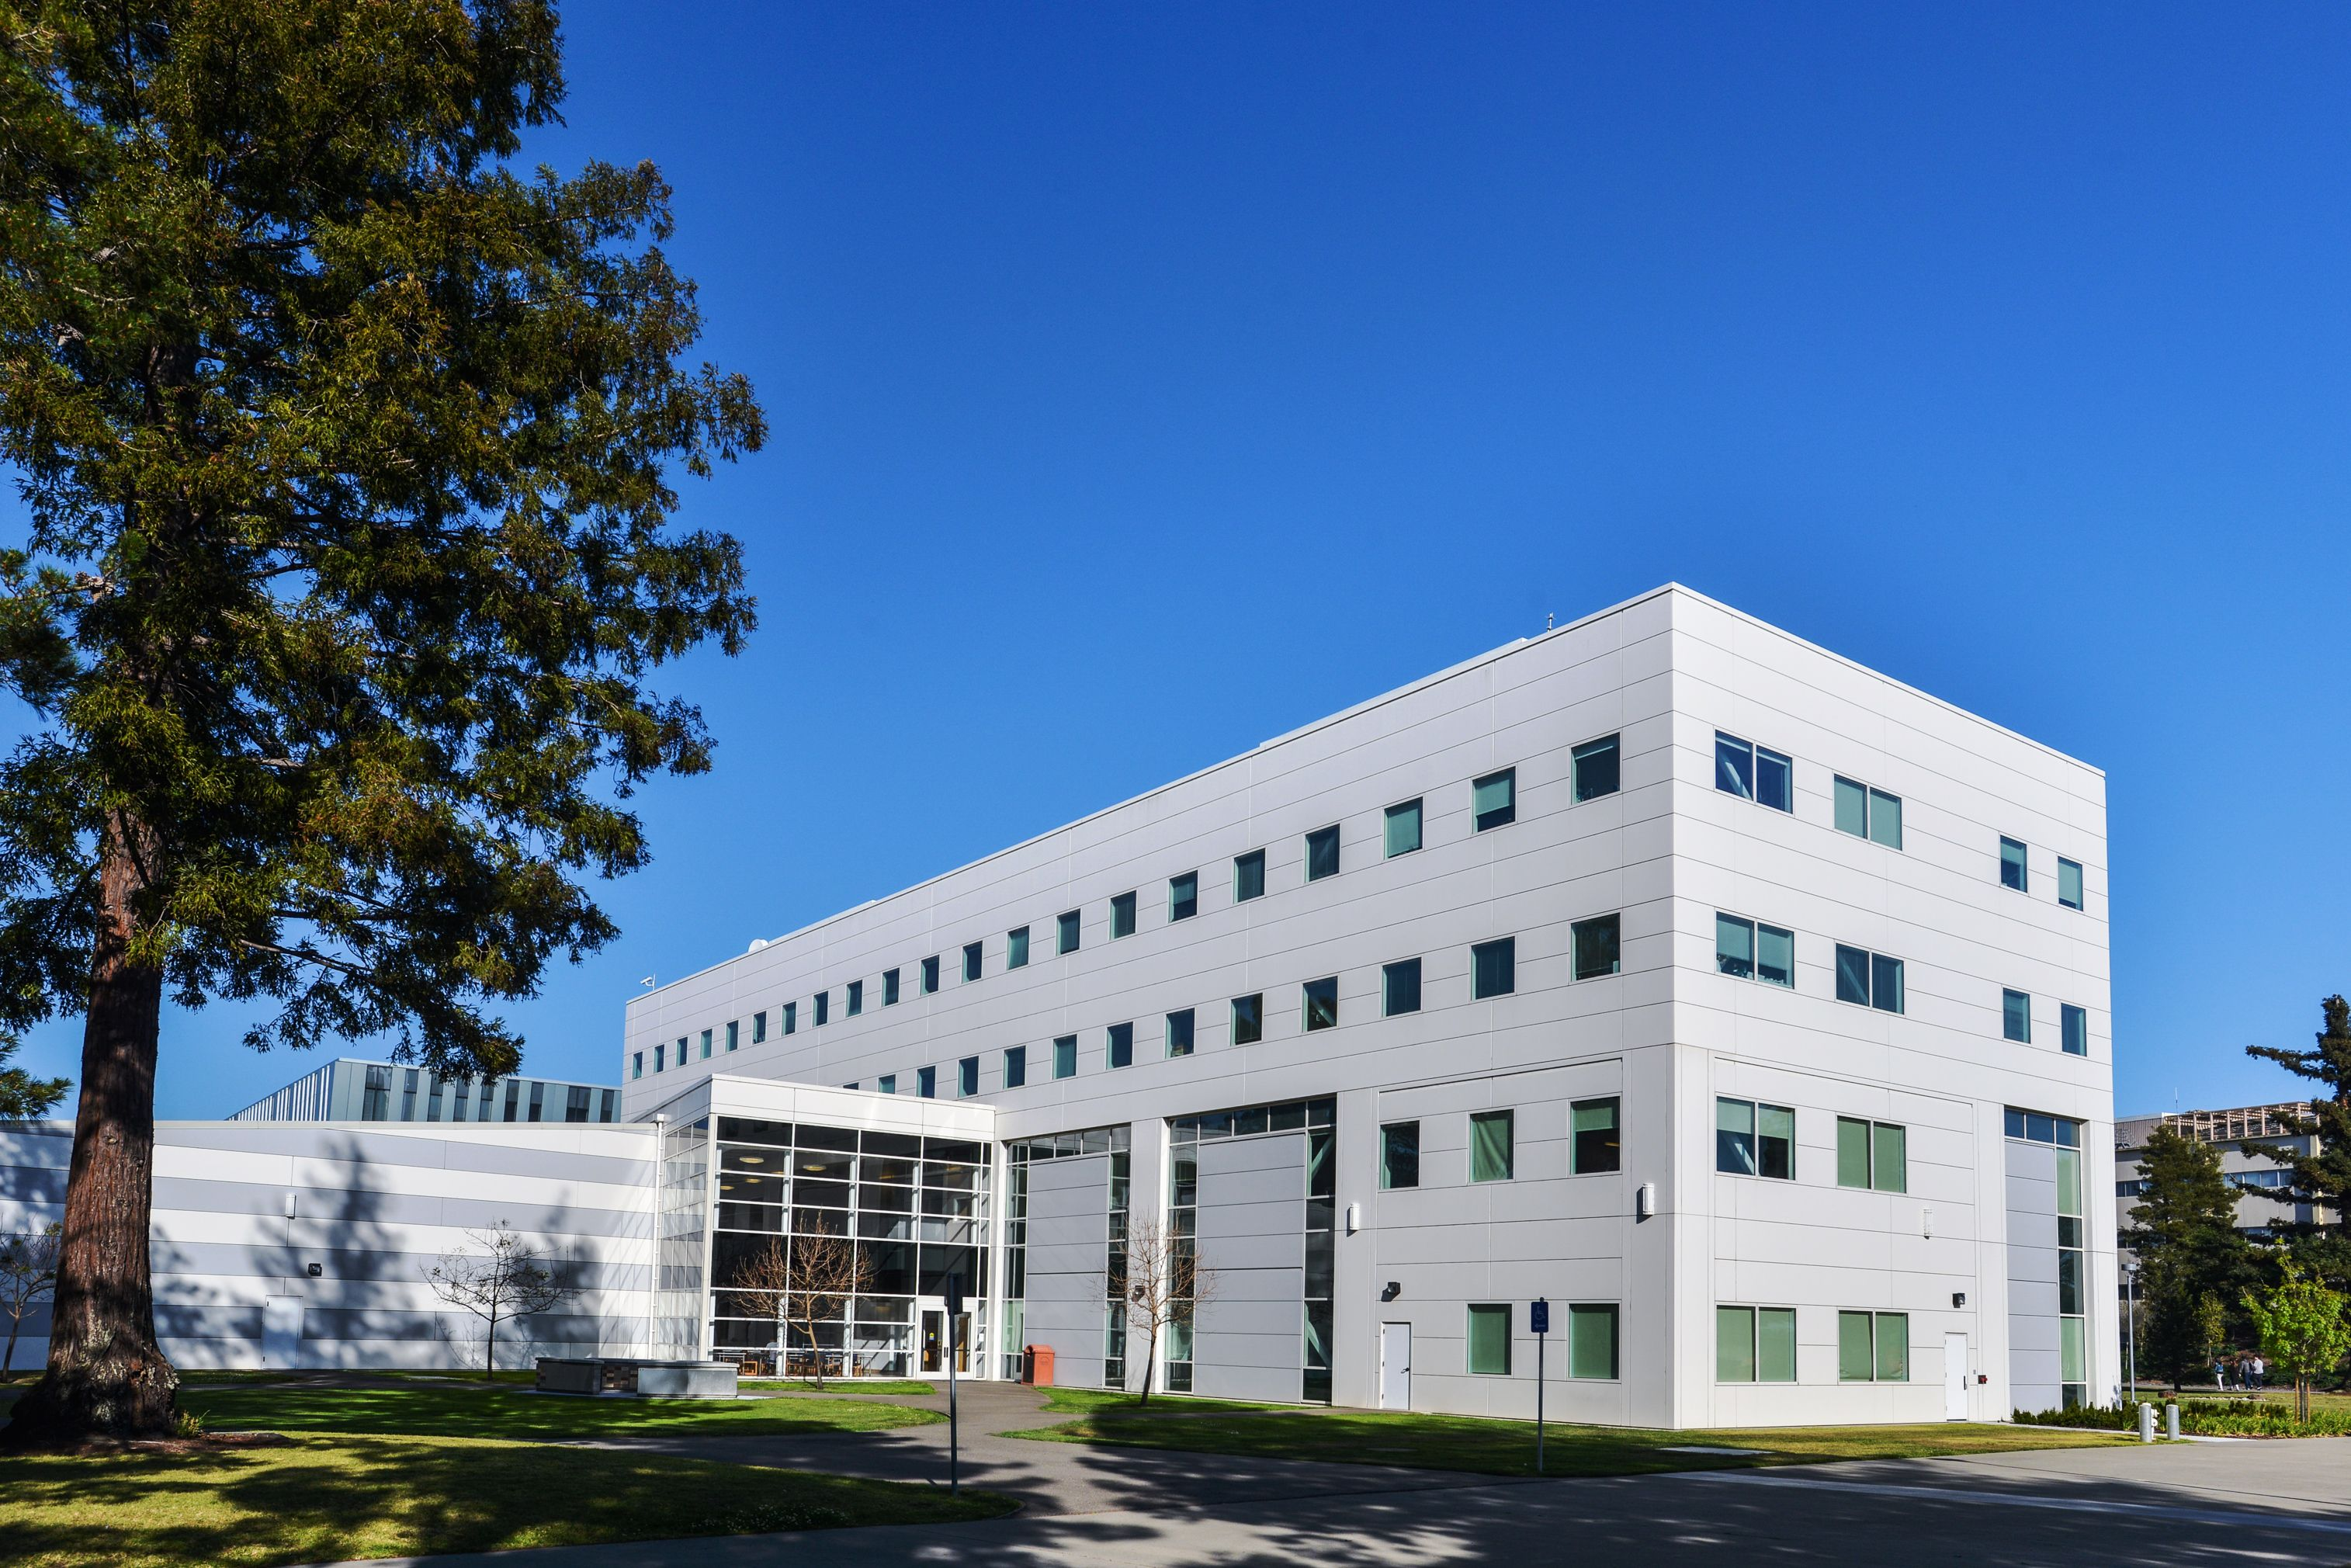 CSUEB, California State University East Bay